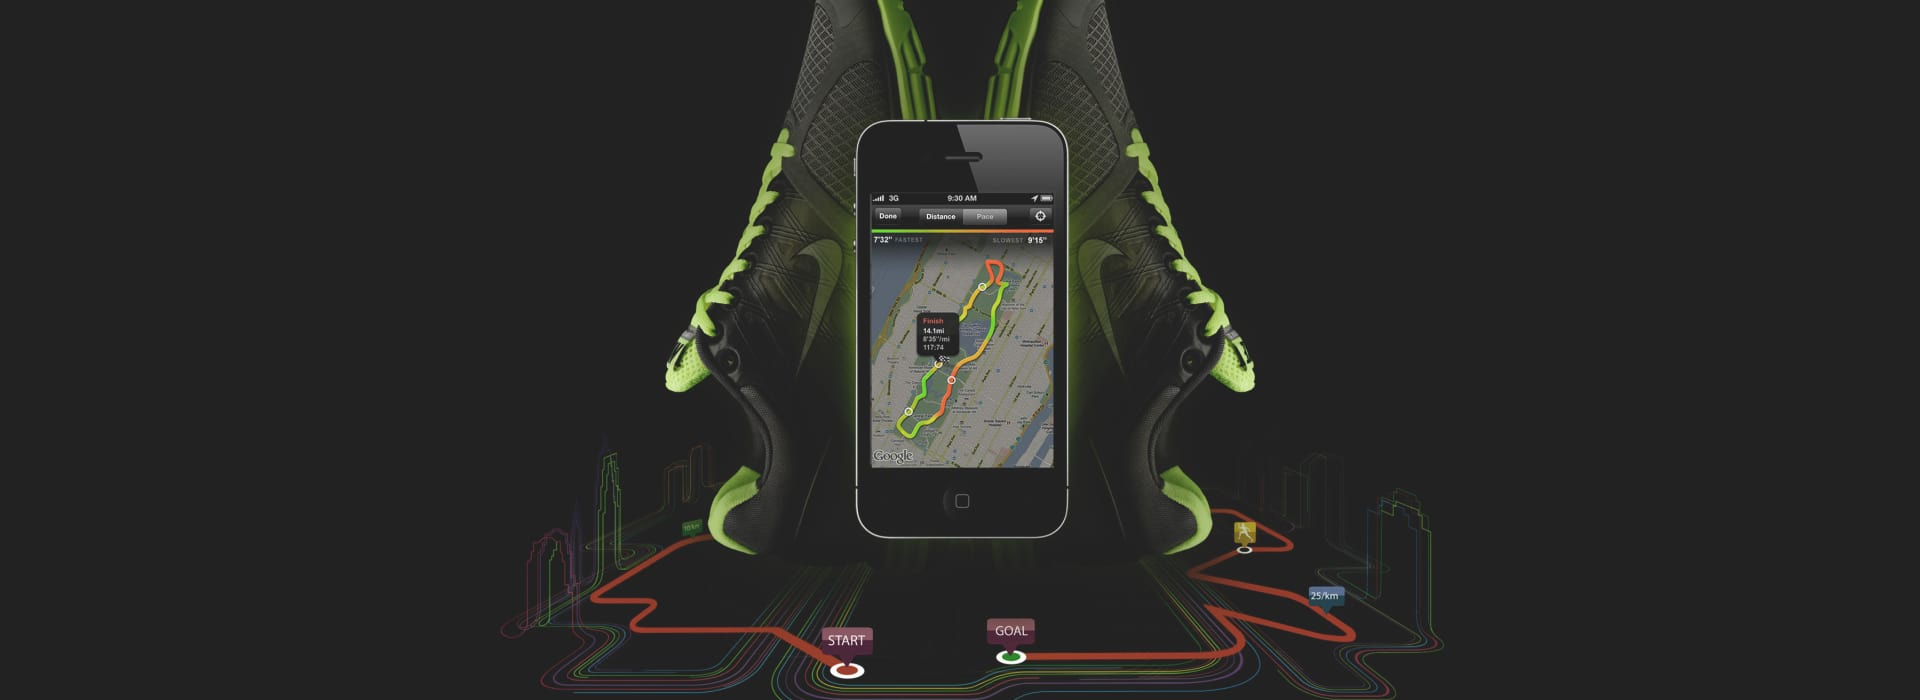 Case study NIKE ERP Nike air max case study